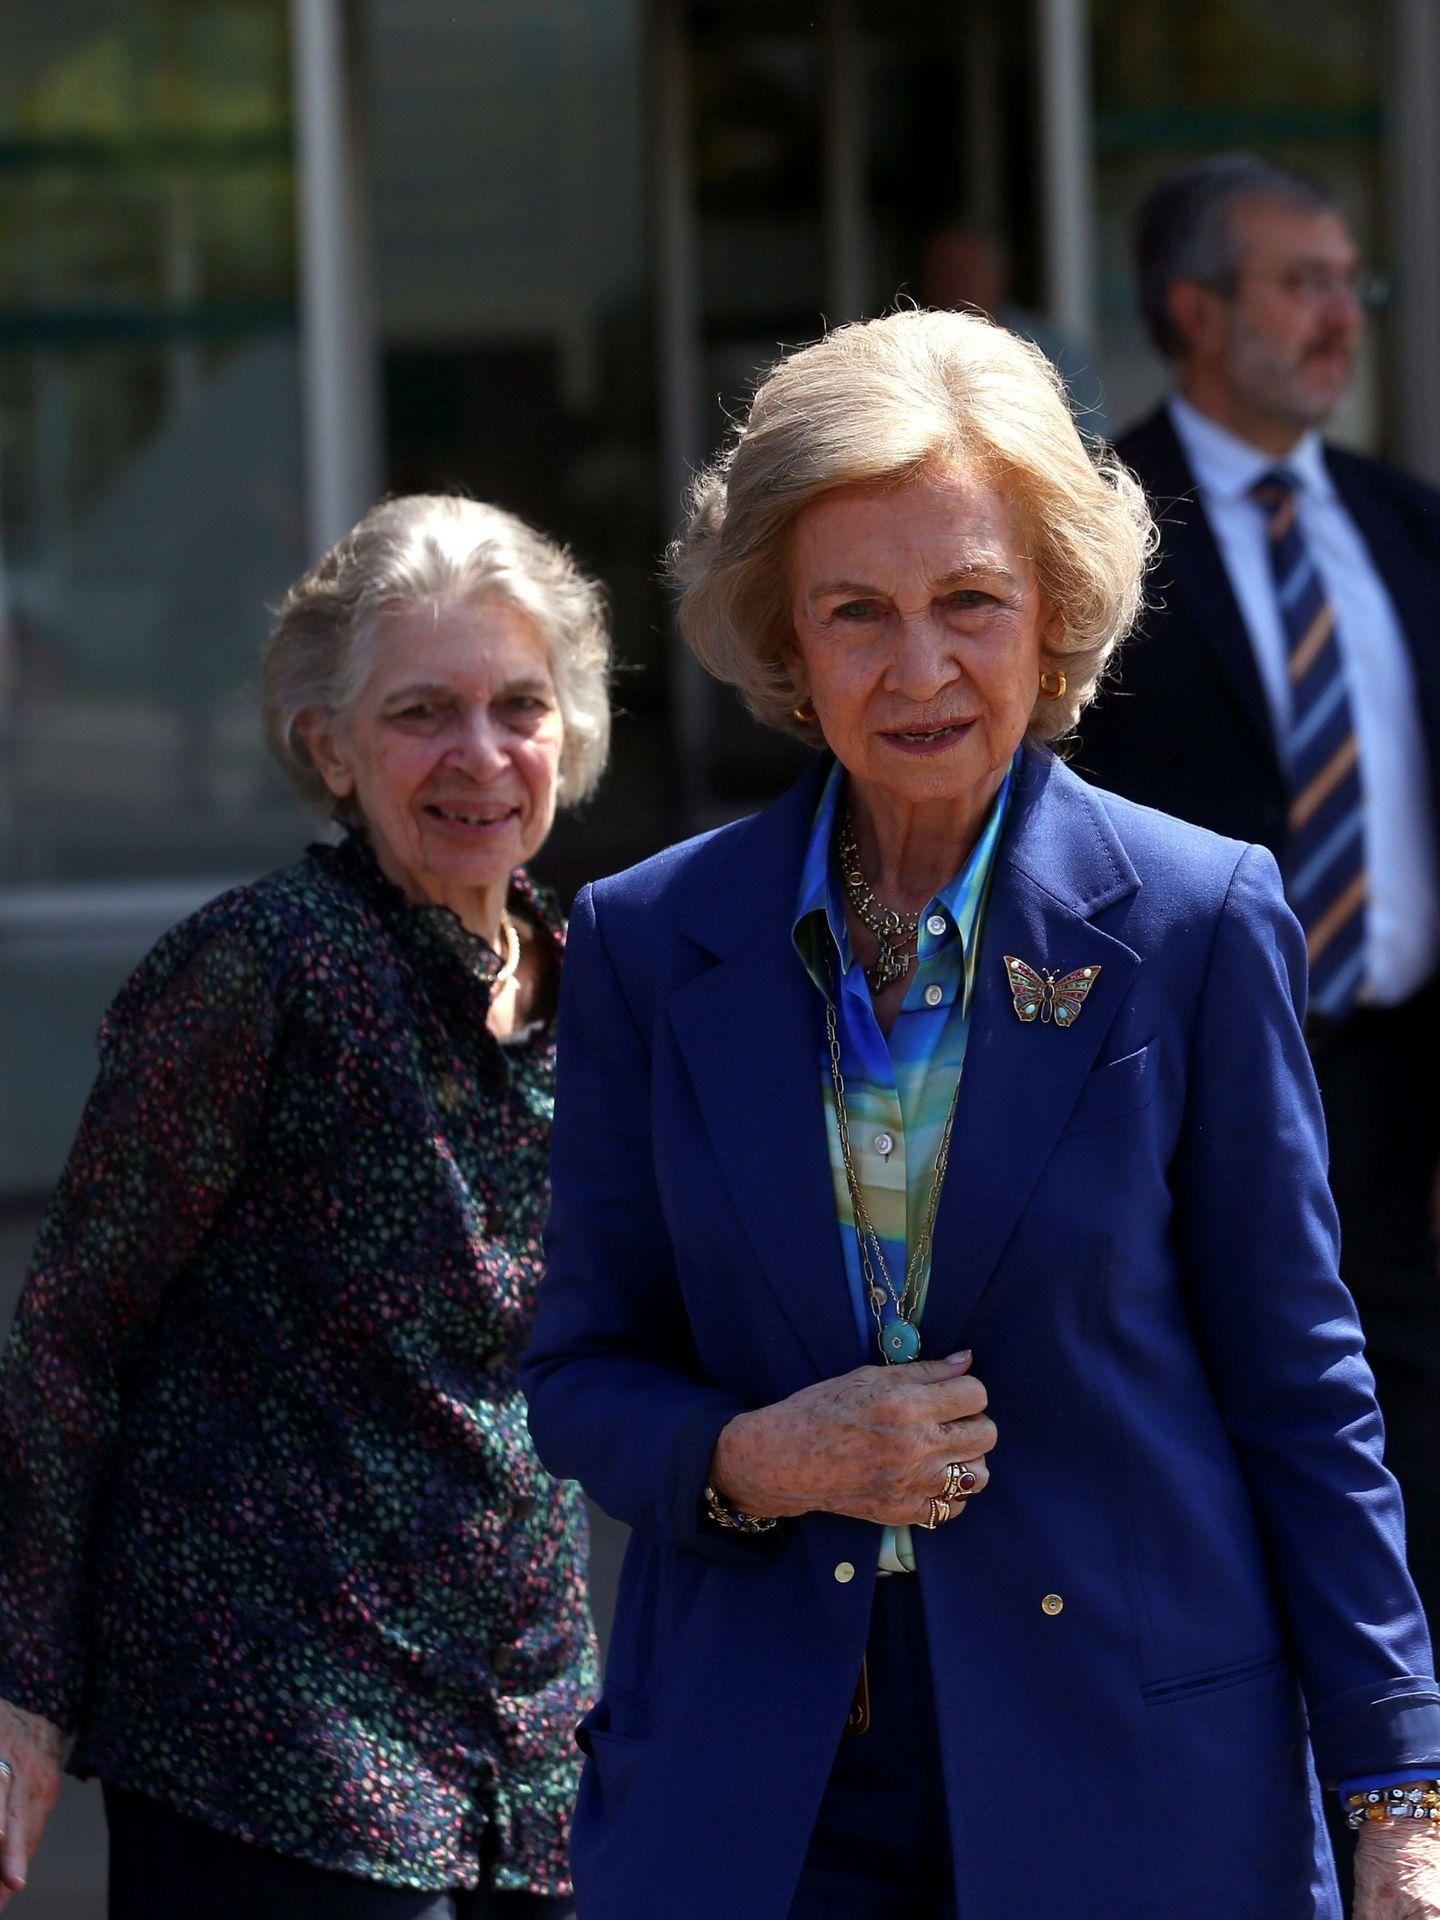 La reina Sofía, junto a su hermana Irene. (EFE)